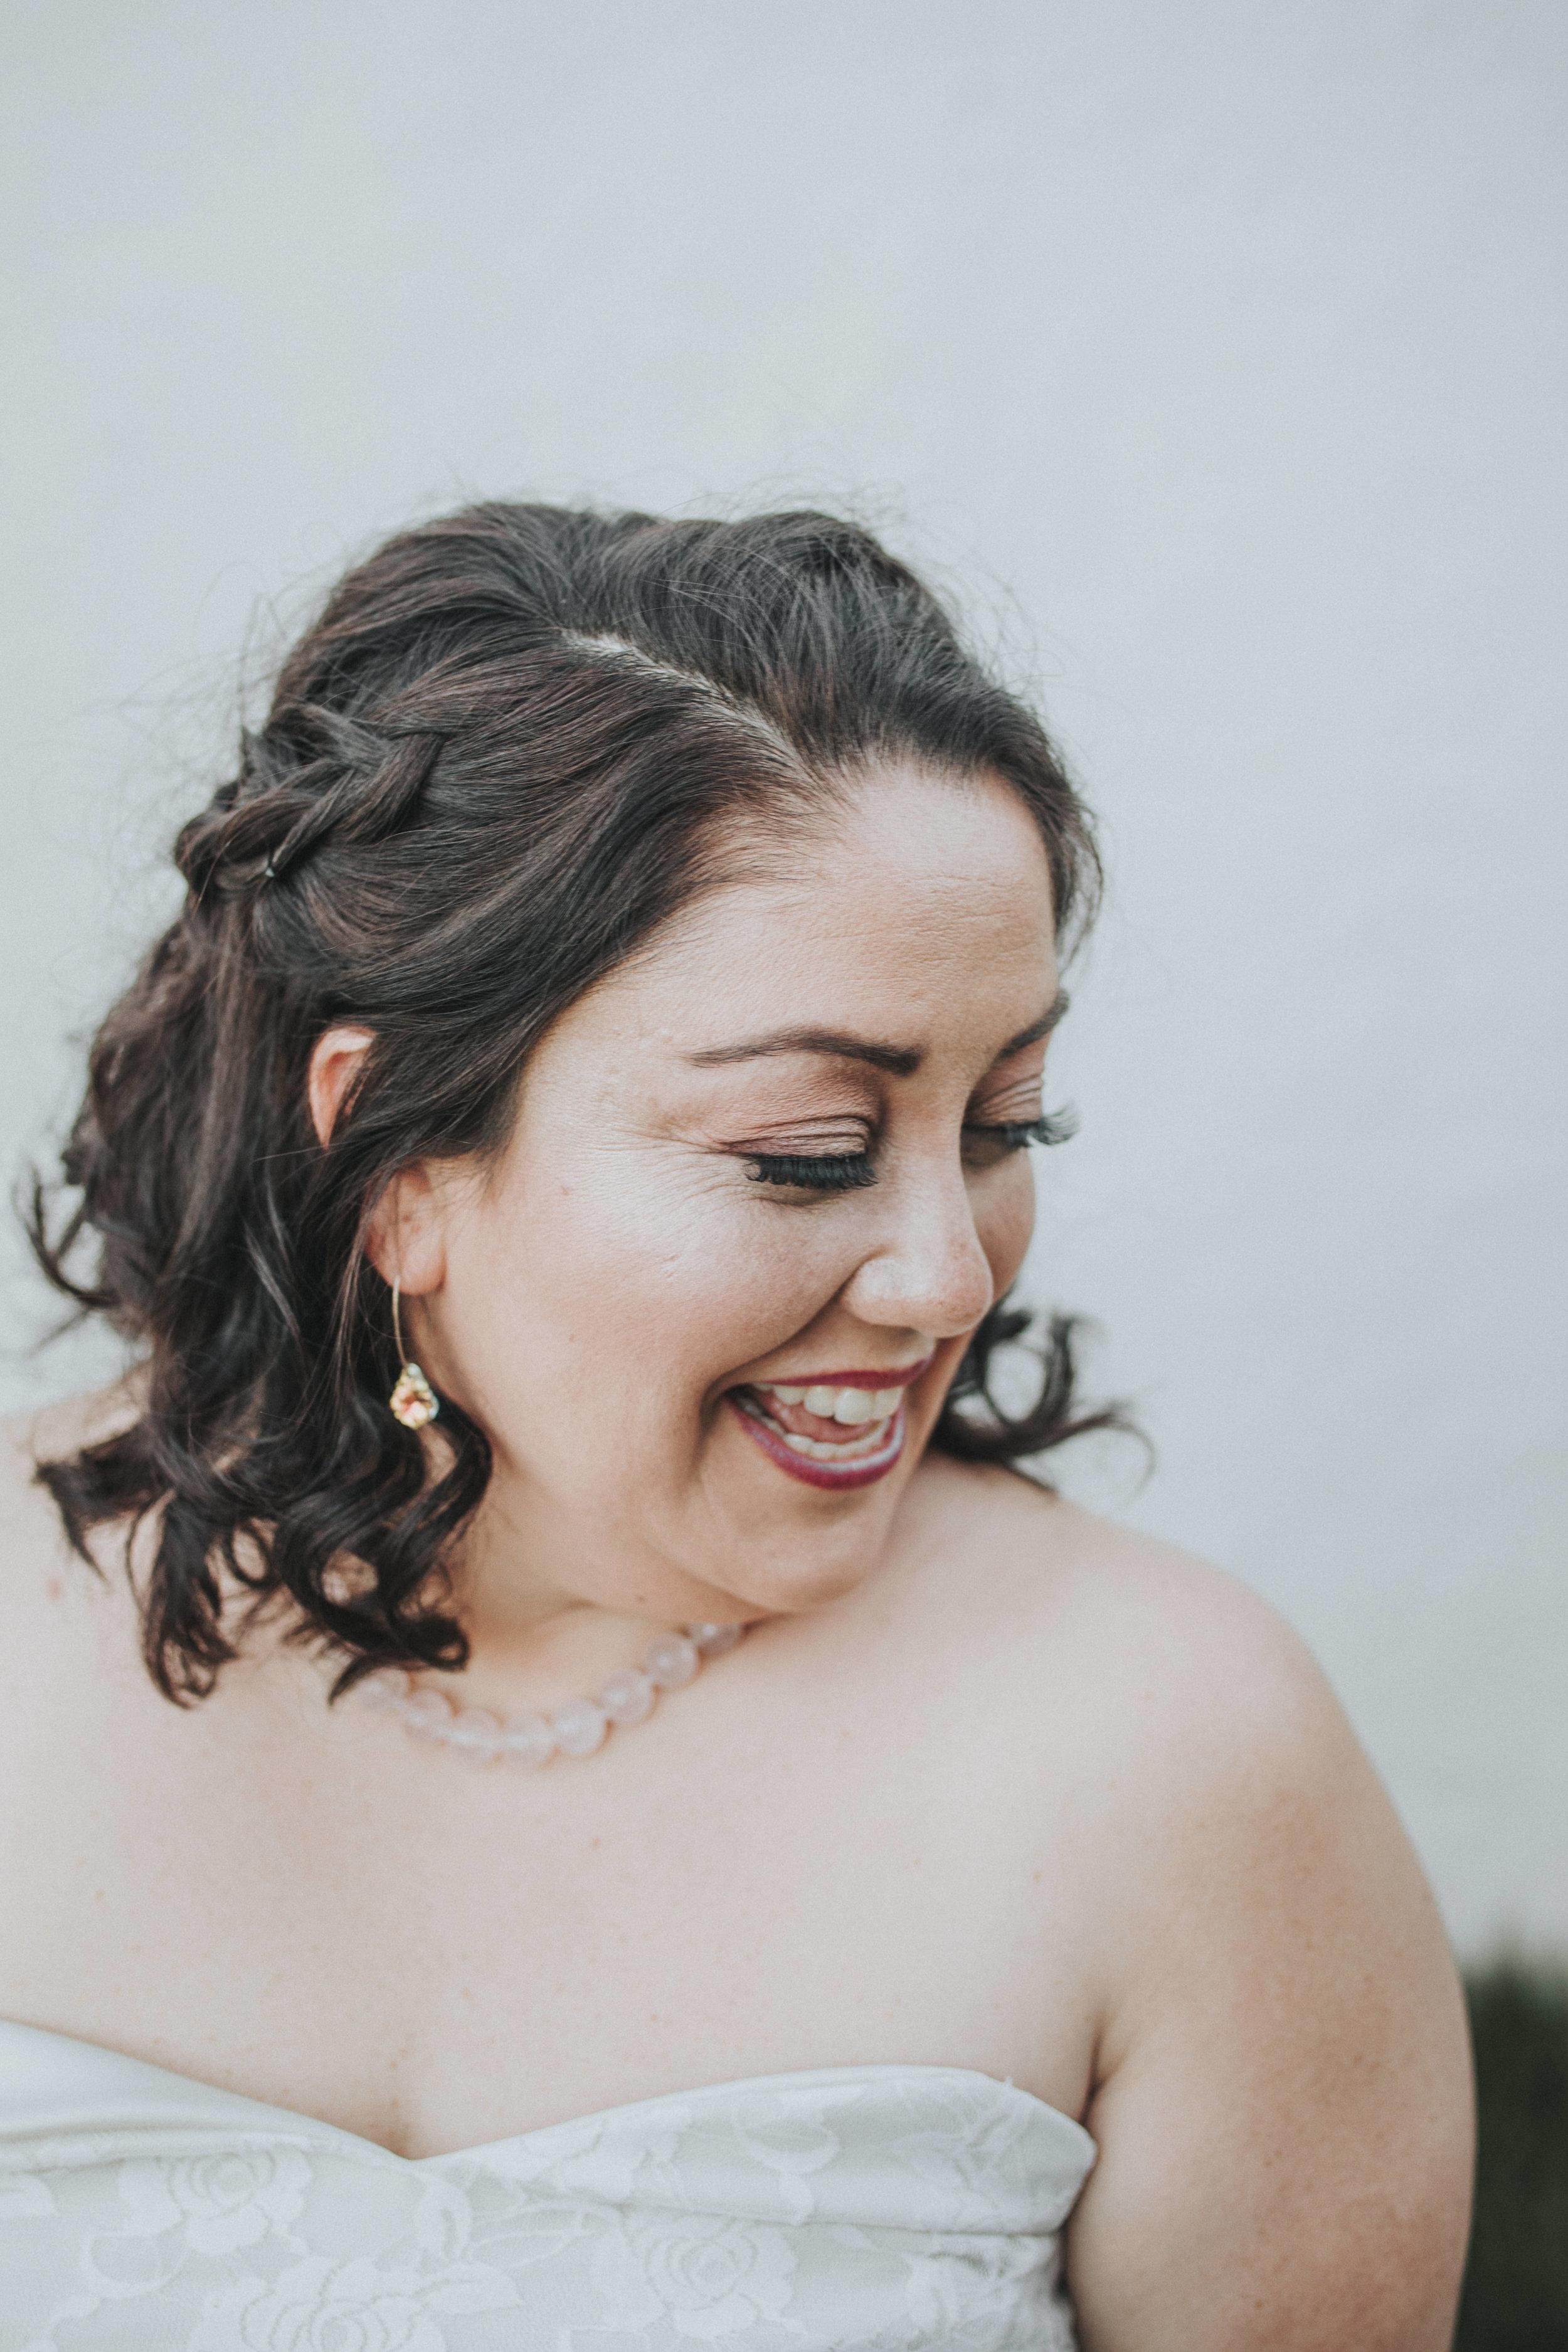 113 midwest-colorado-nebraska-elopement-photography-gretna-turtledoves.jpg